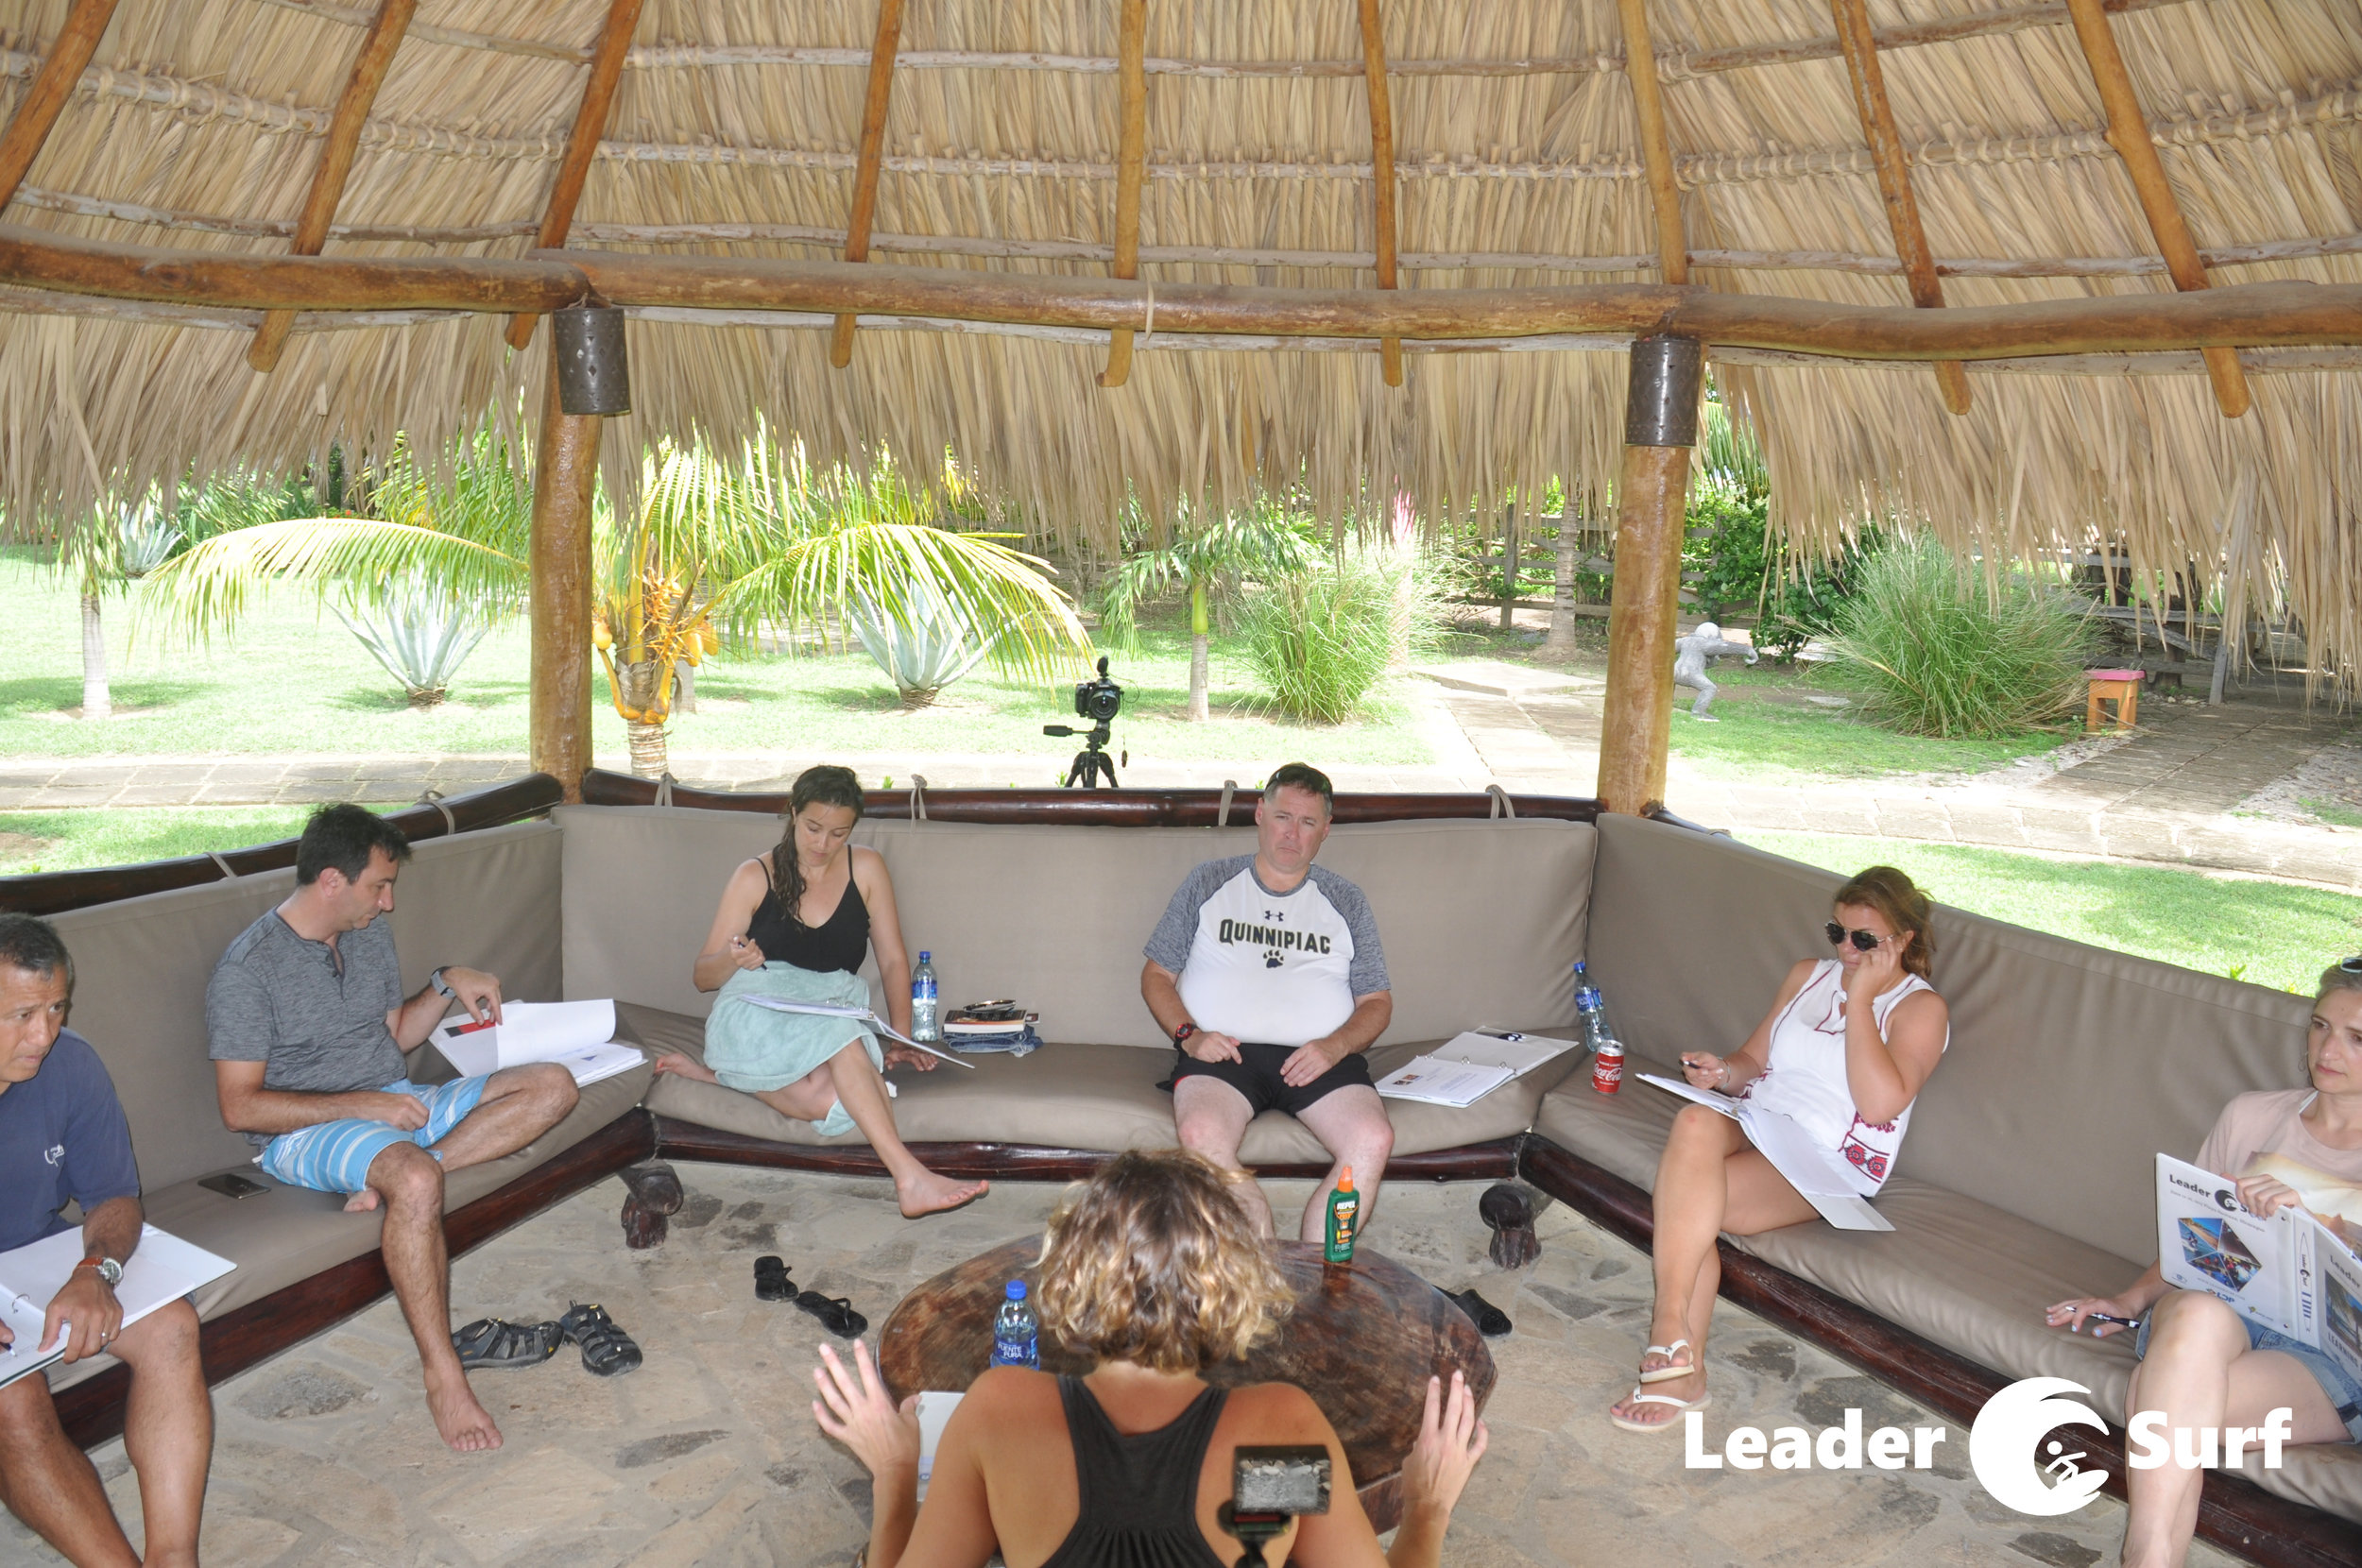 Tiki hut business challenge